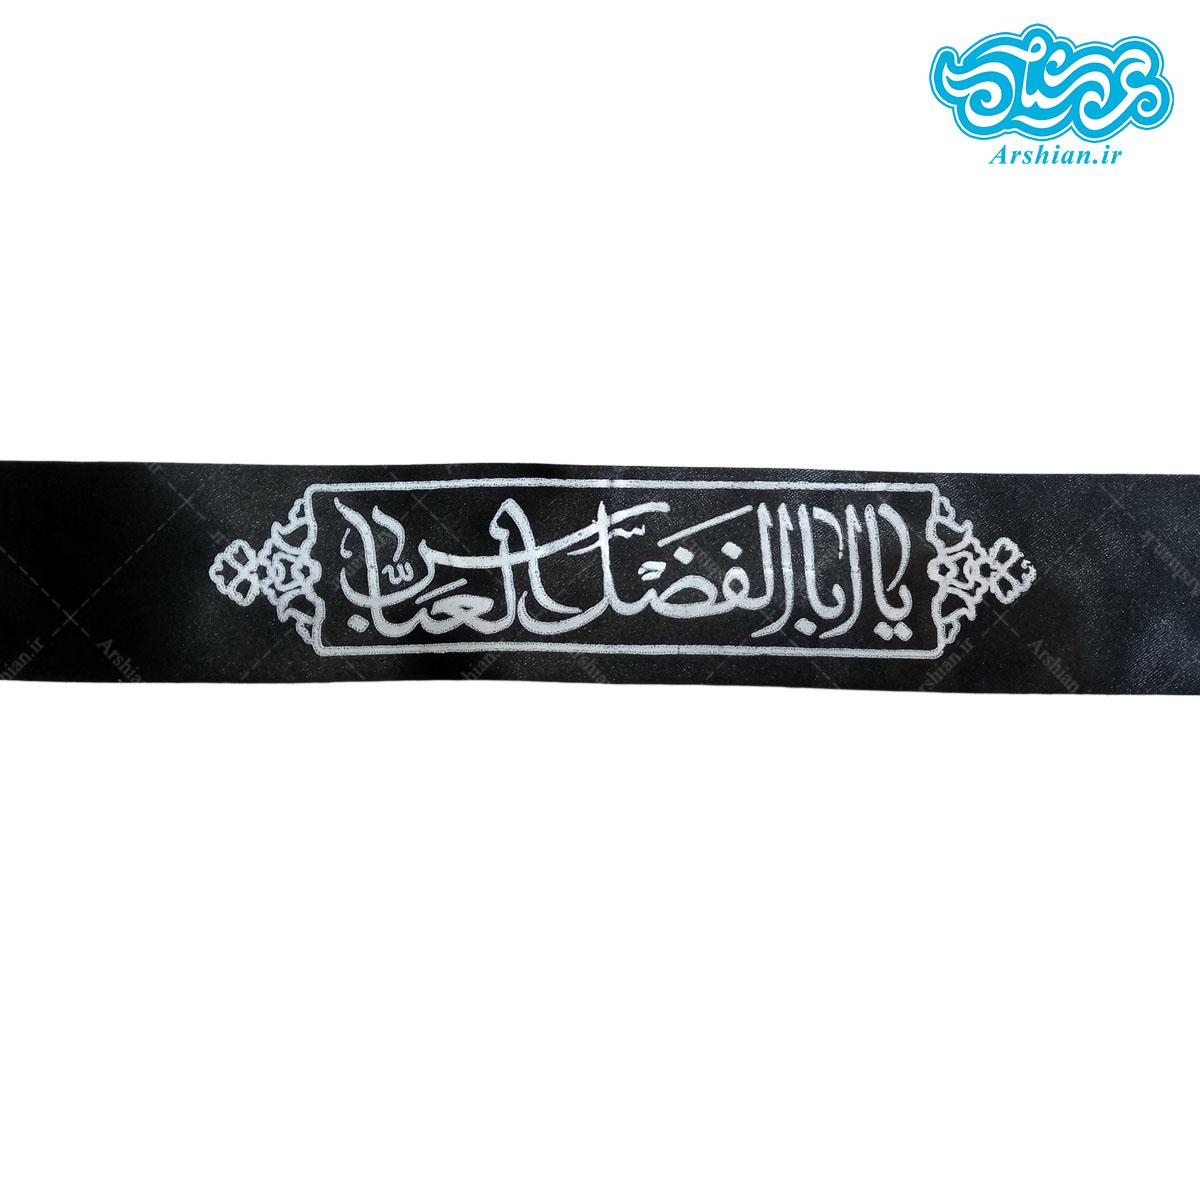 سربند ساتن یاابالفضل العباس مشکی کد027